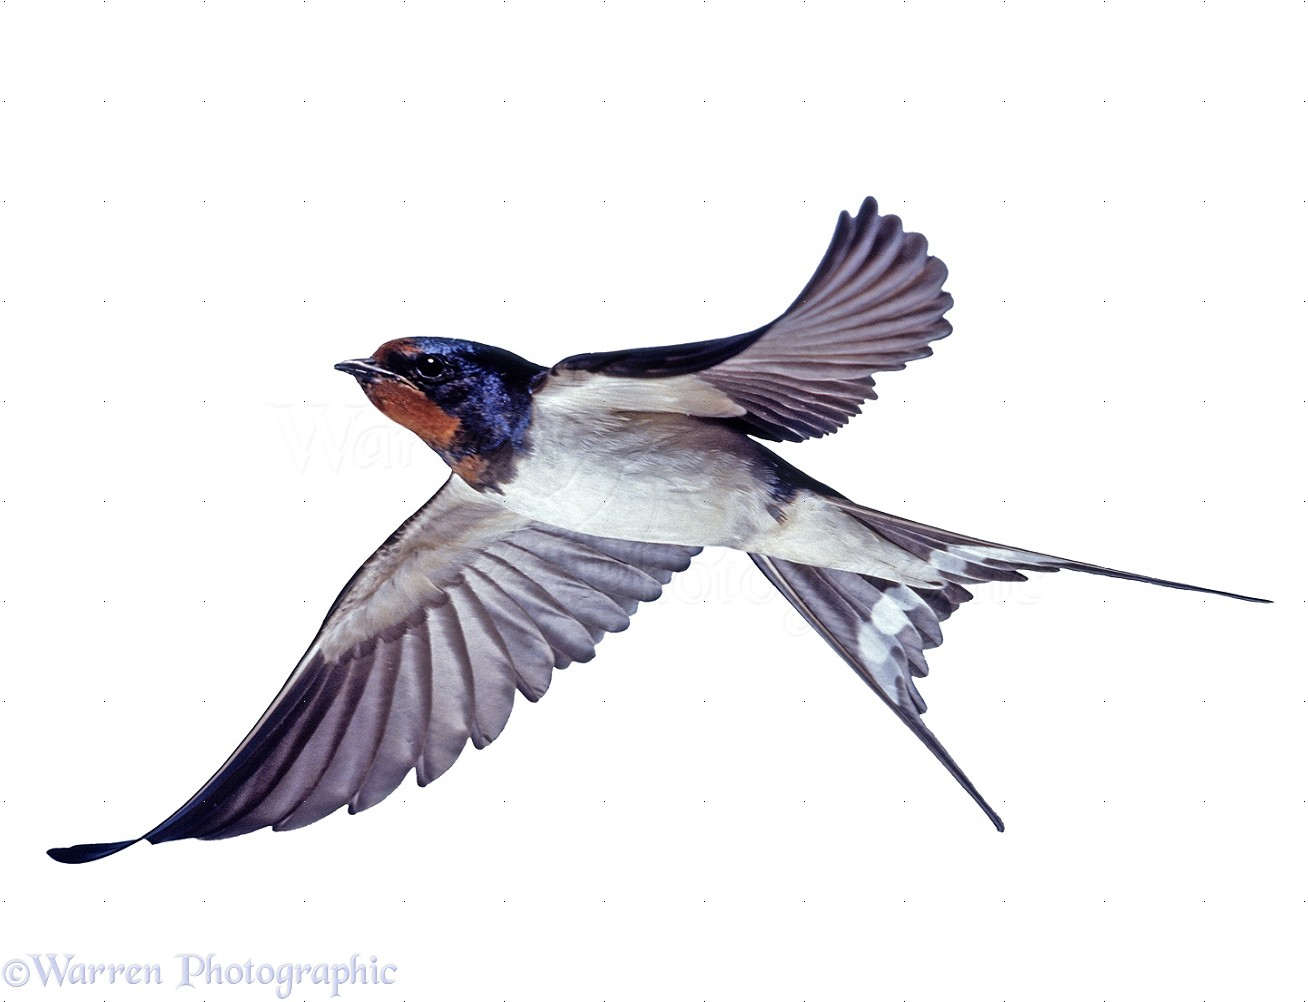 Swallow in flight photo - WP28020